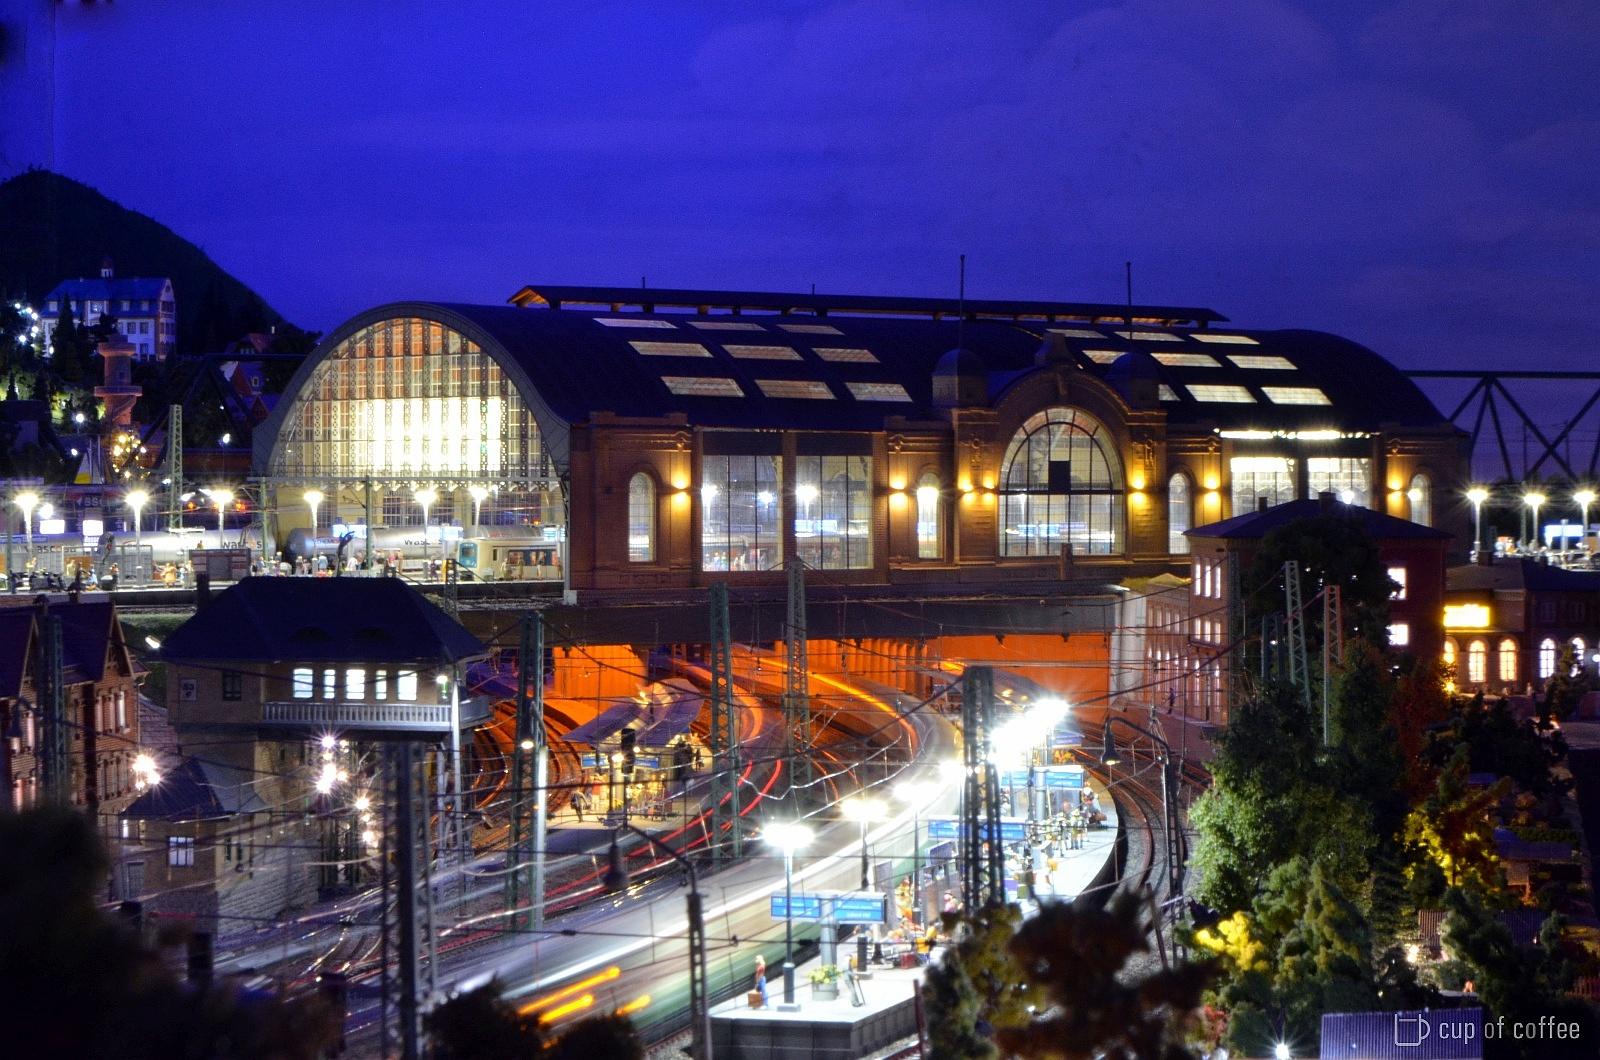 Bahnhof Dammtor